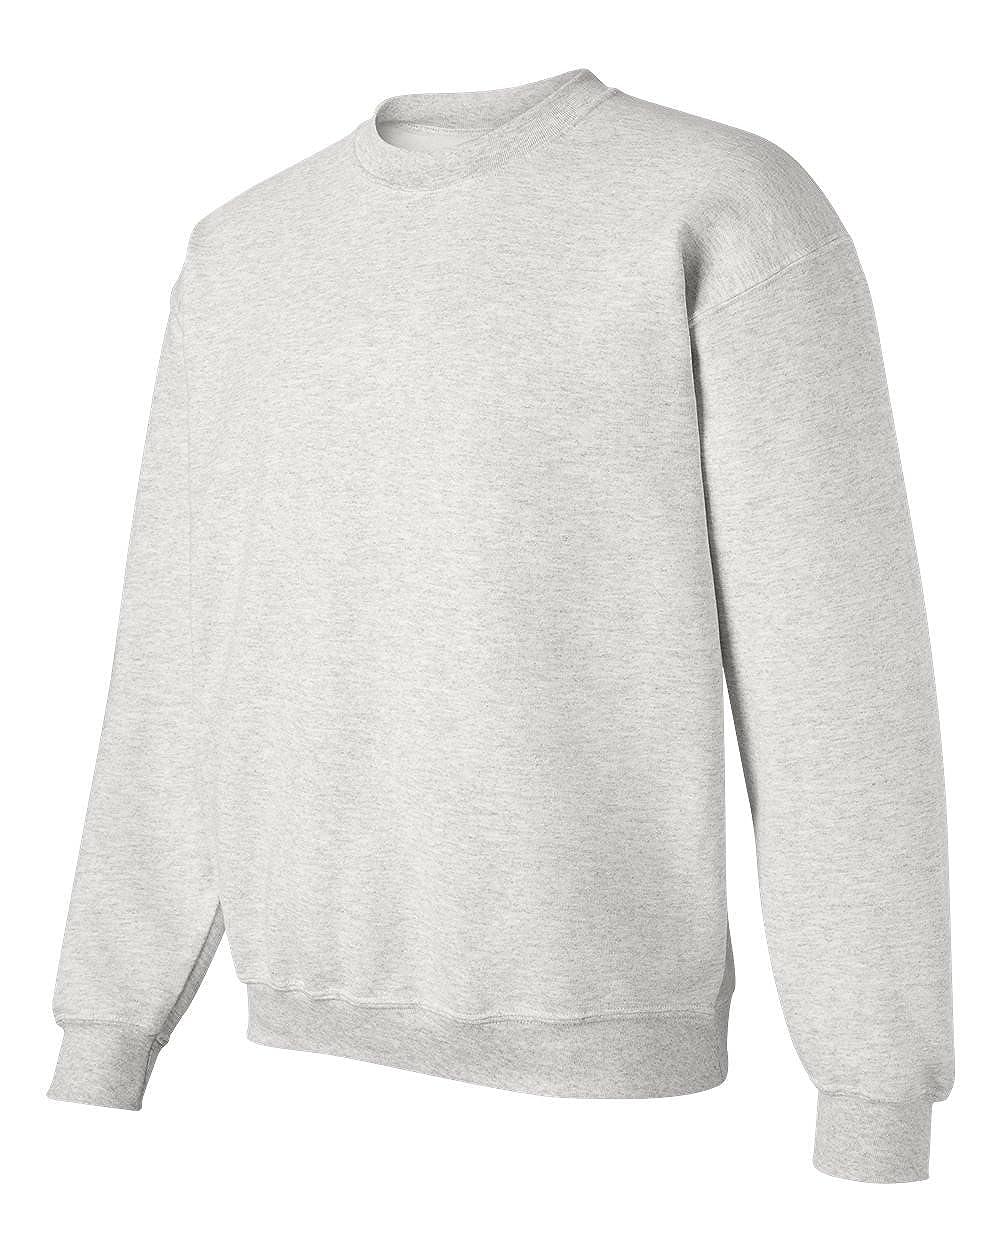 f9caacbf Gildan G12000 DryBlend Adult Crewneck Sweatshirt at Amazon Men's Clothing  store: